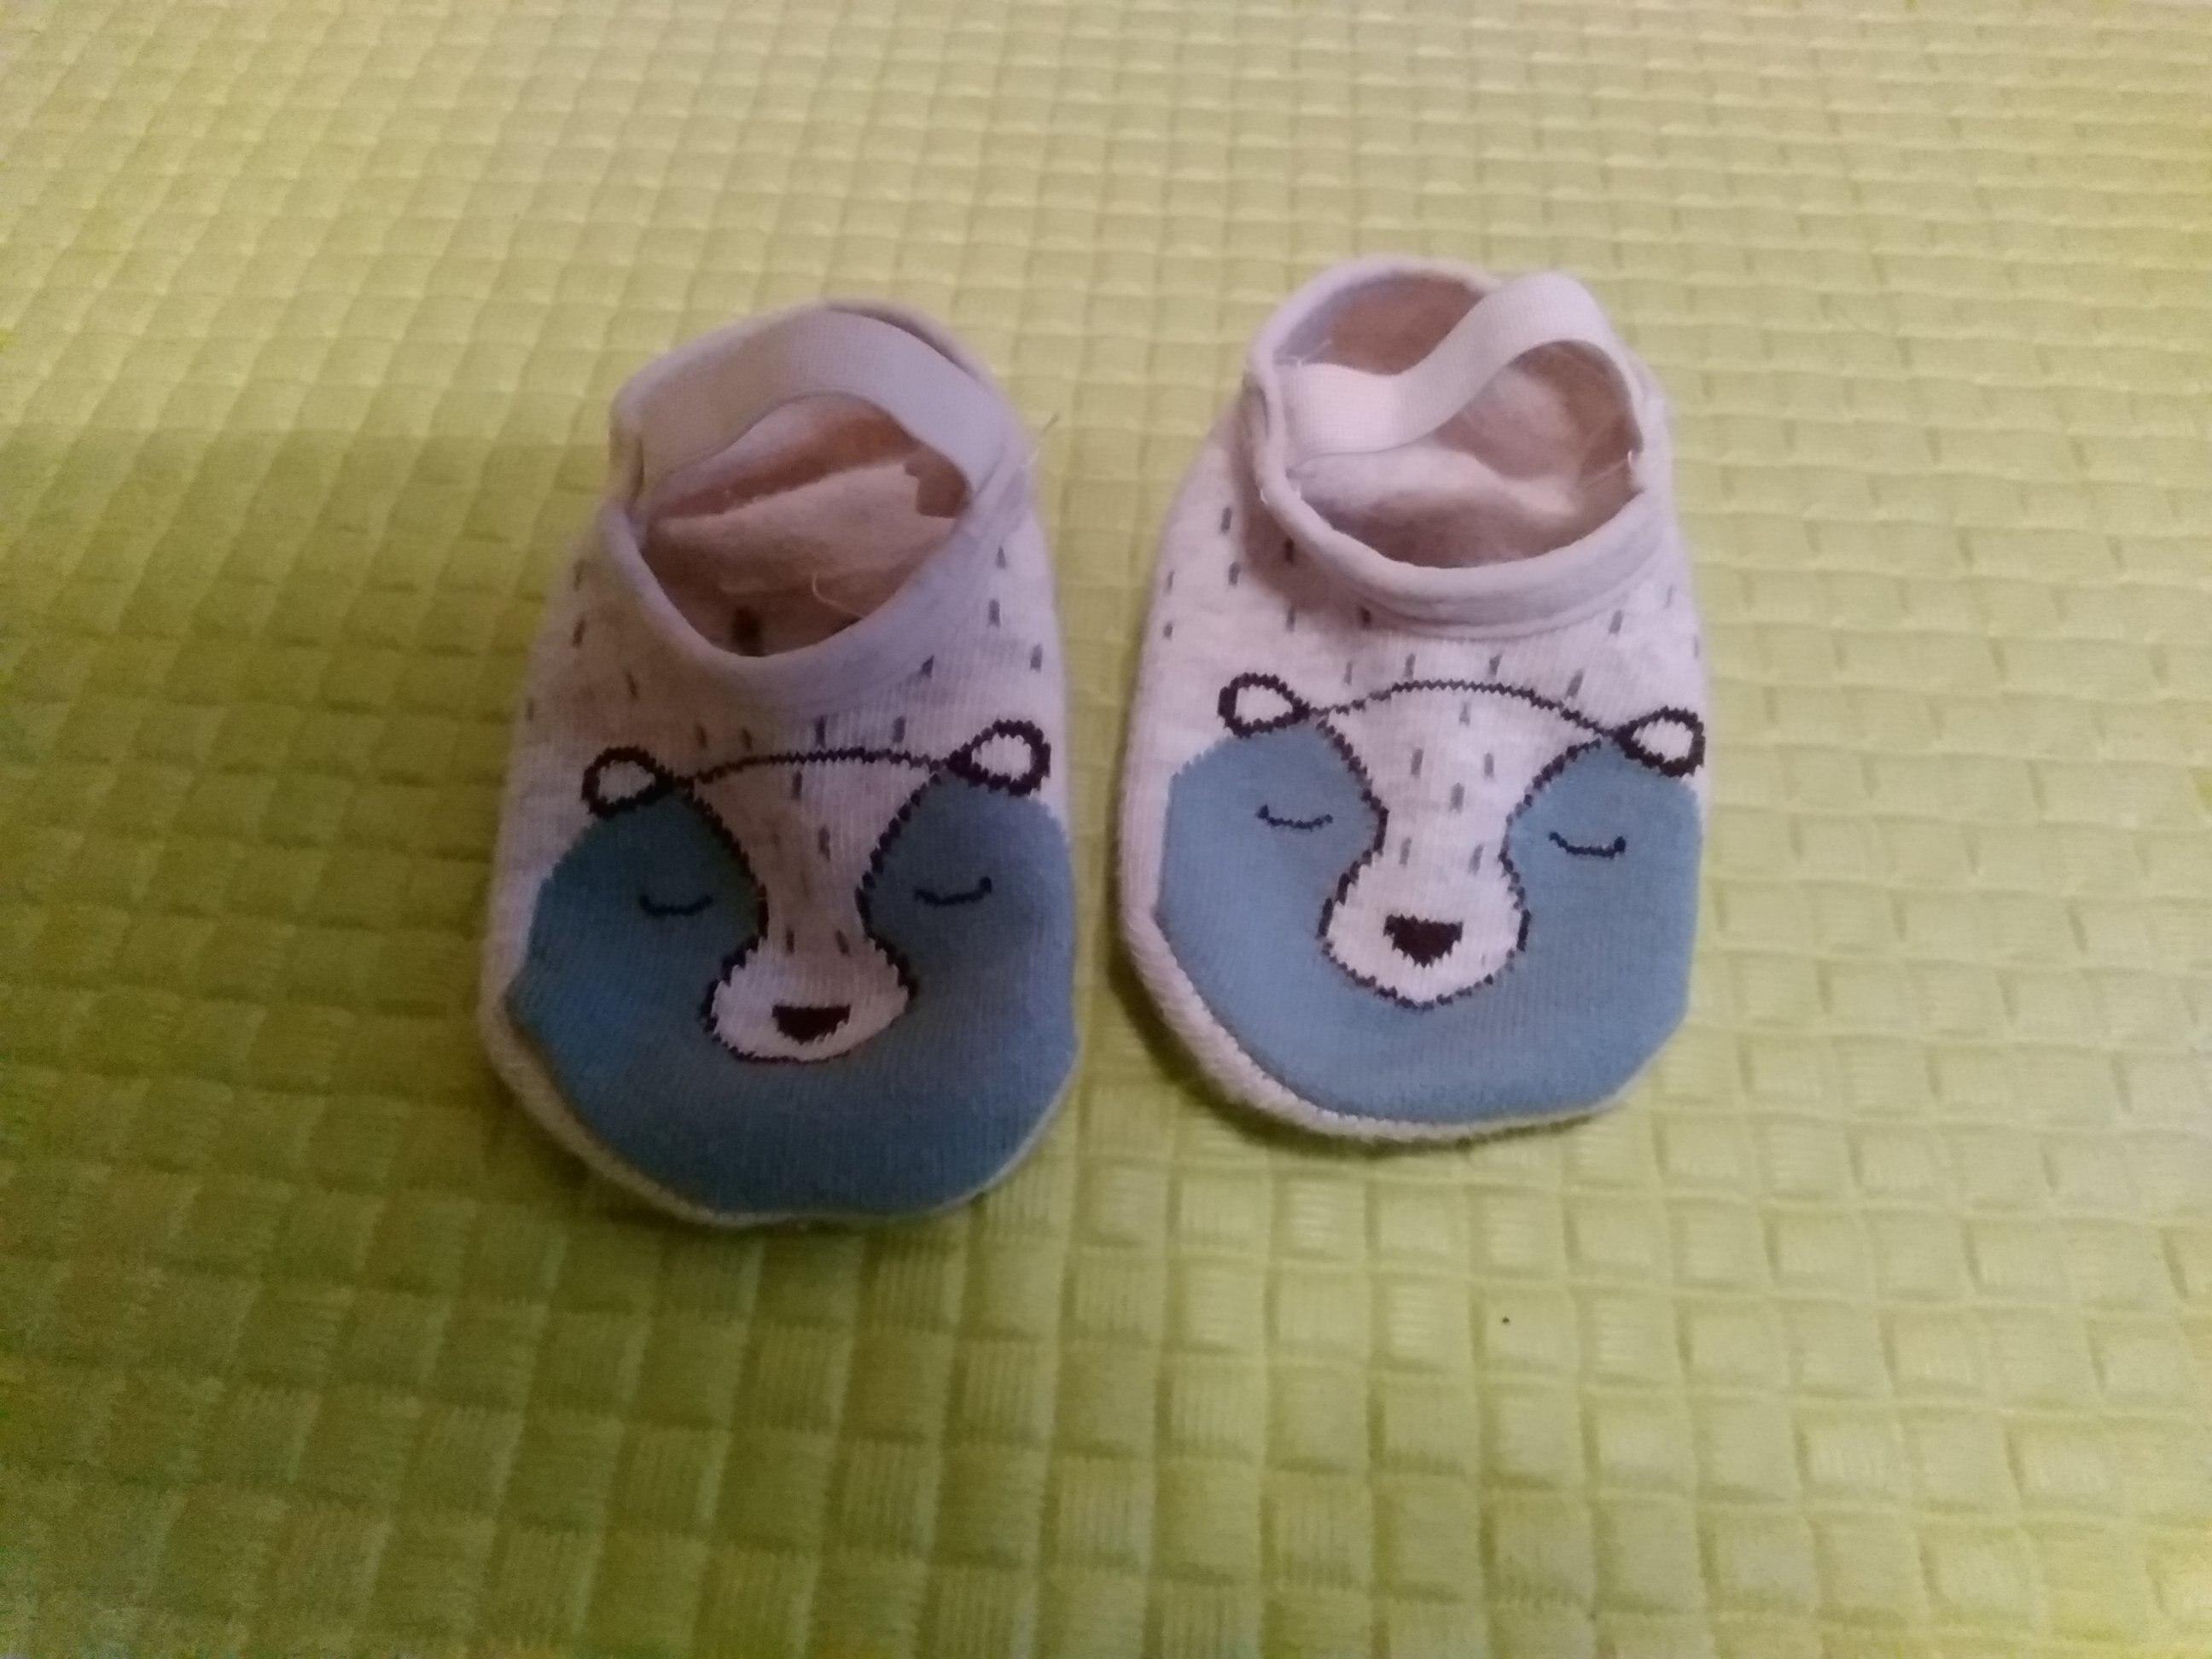 Winter Autumn Baby Socks Floor Non-slip Cotton Toddler Animal  Newborn Socks Cute Baby Girls Boys Soft Knitted Infant Boots